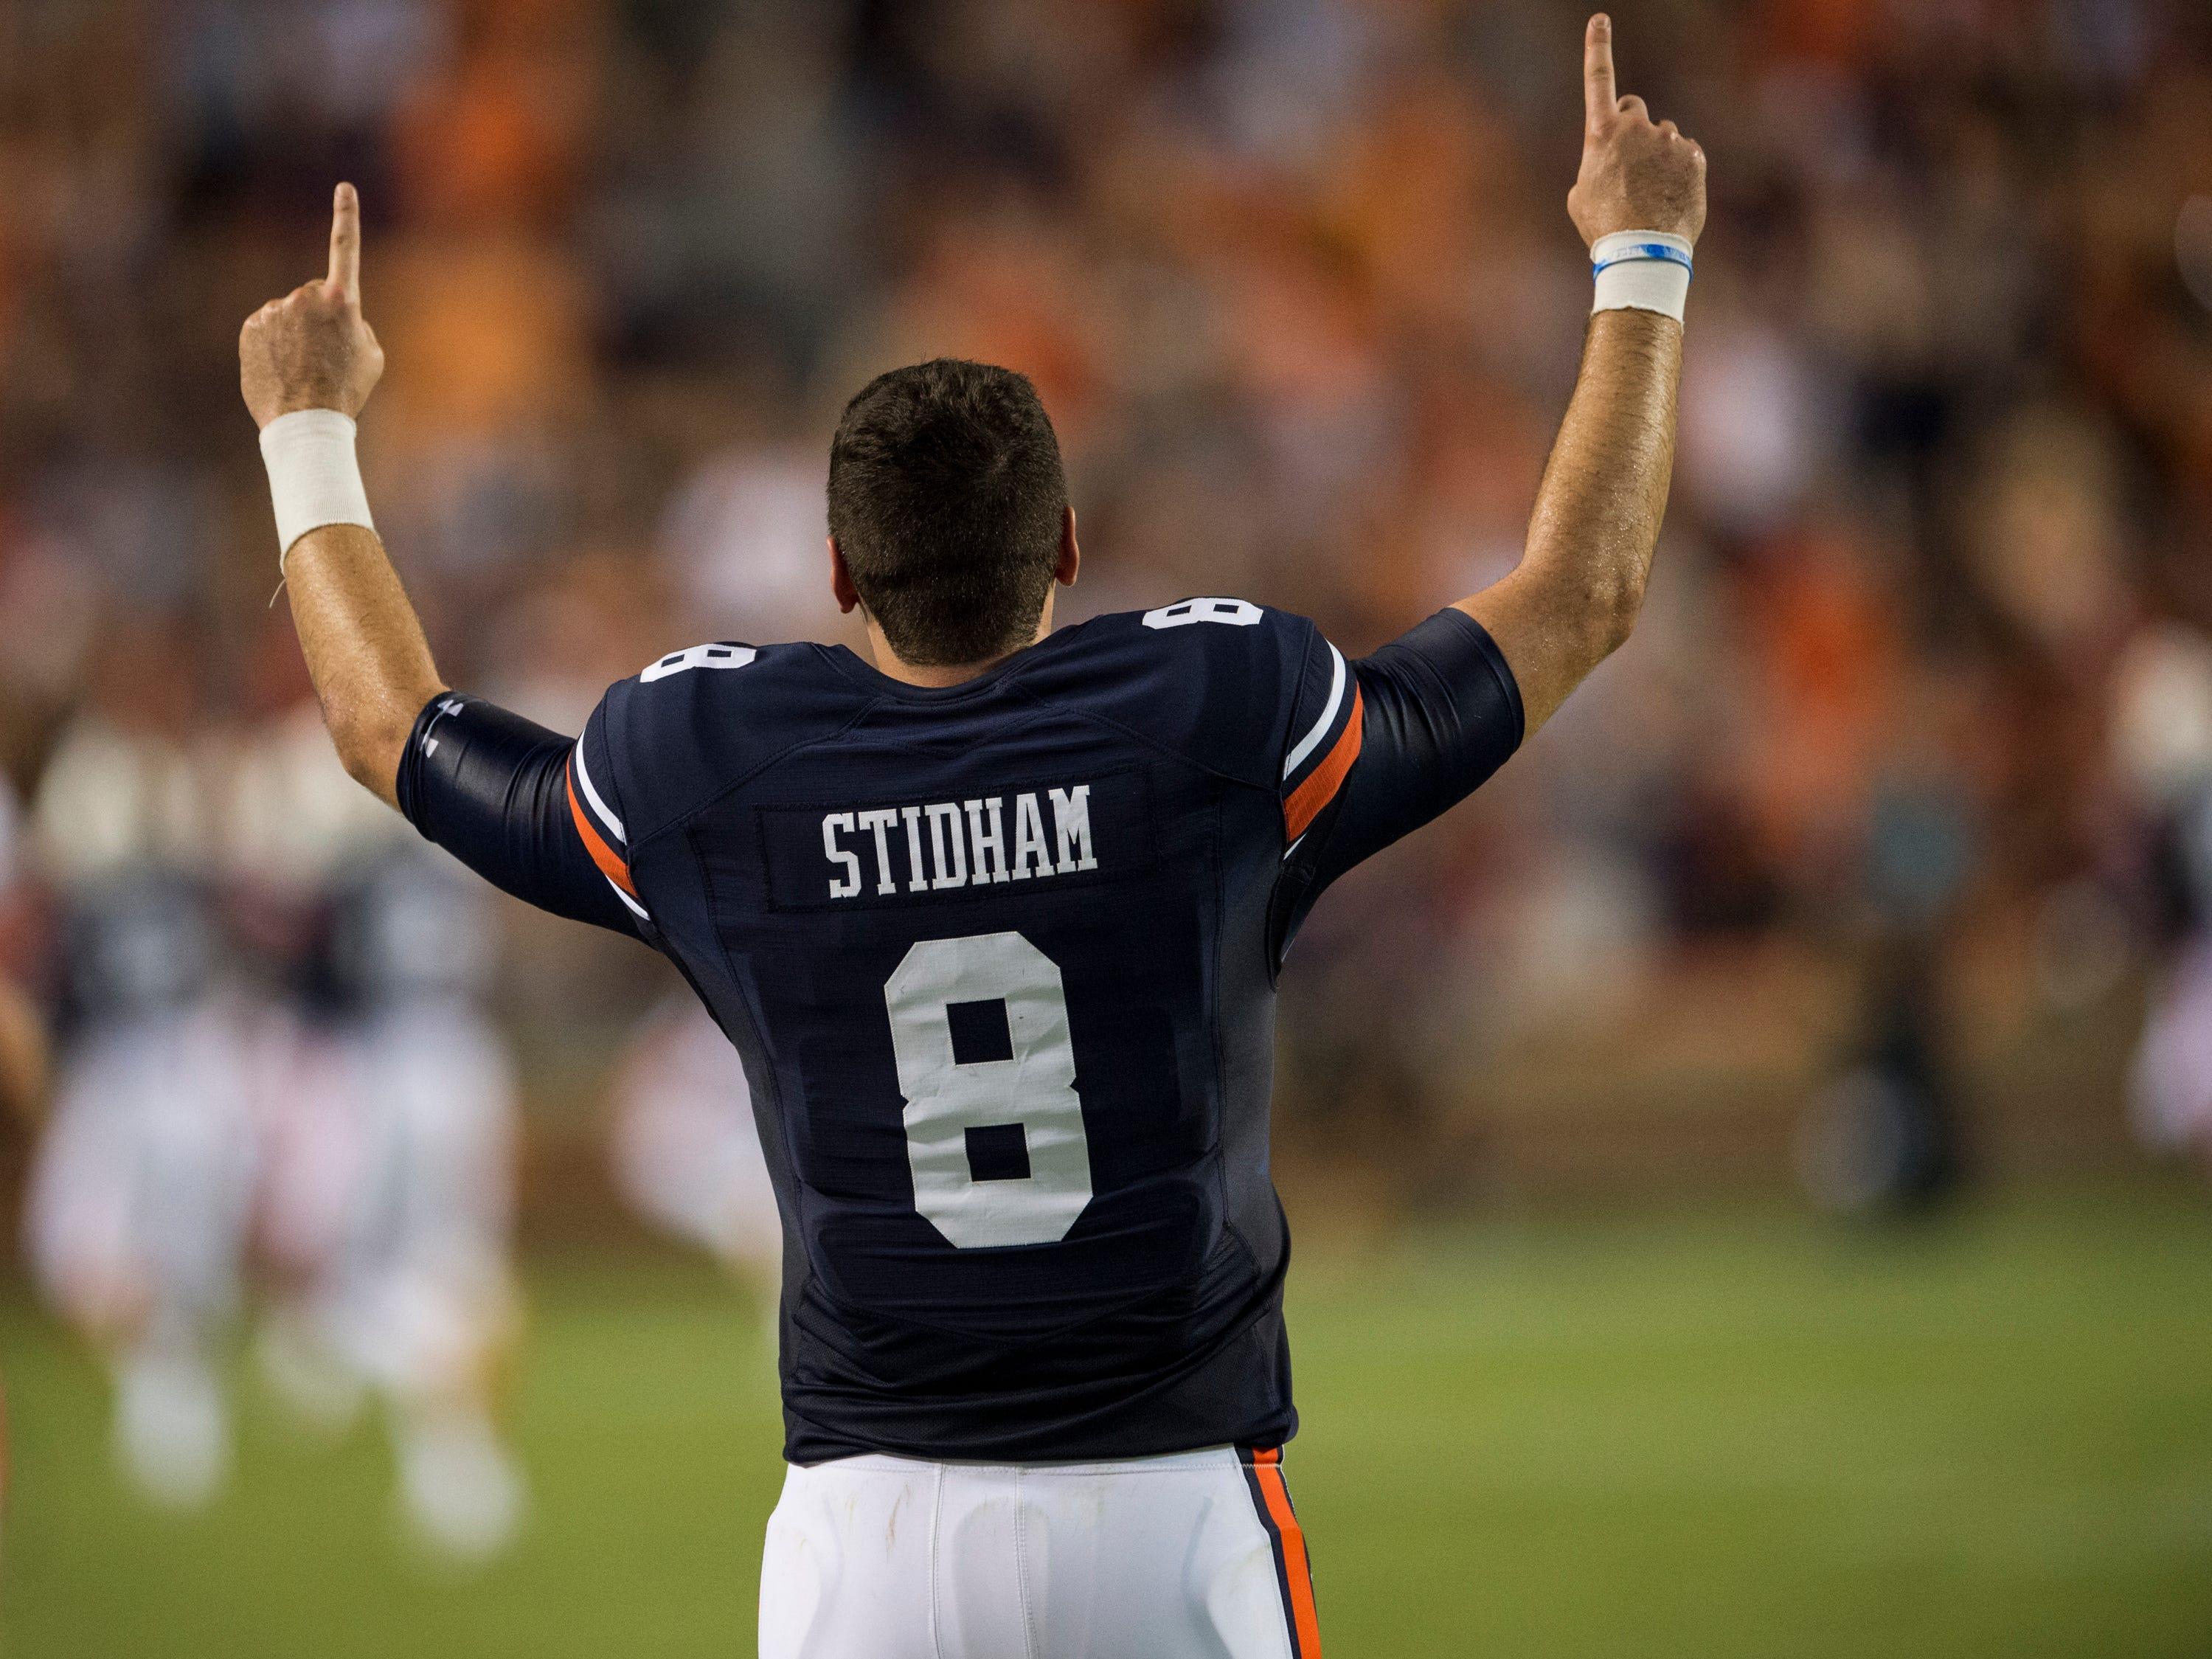 Auburn's Jarrett Stidham (8) celebrates as his defense intercepts the ball and scores a touchdown against Alabama State at Jordan-Hare Stadium in Auburn, Ala., on Saturday, Sept. 8, 2018. Auburn defeated Alabama State 63-9.